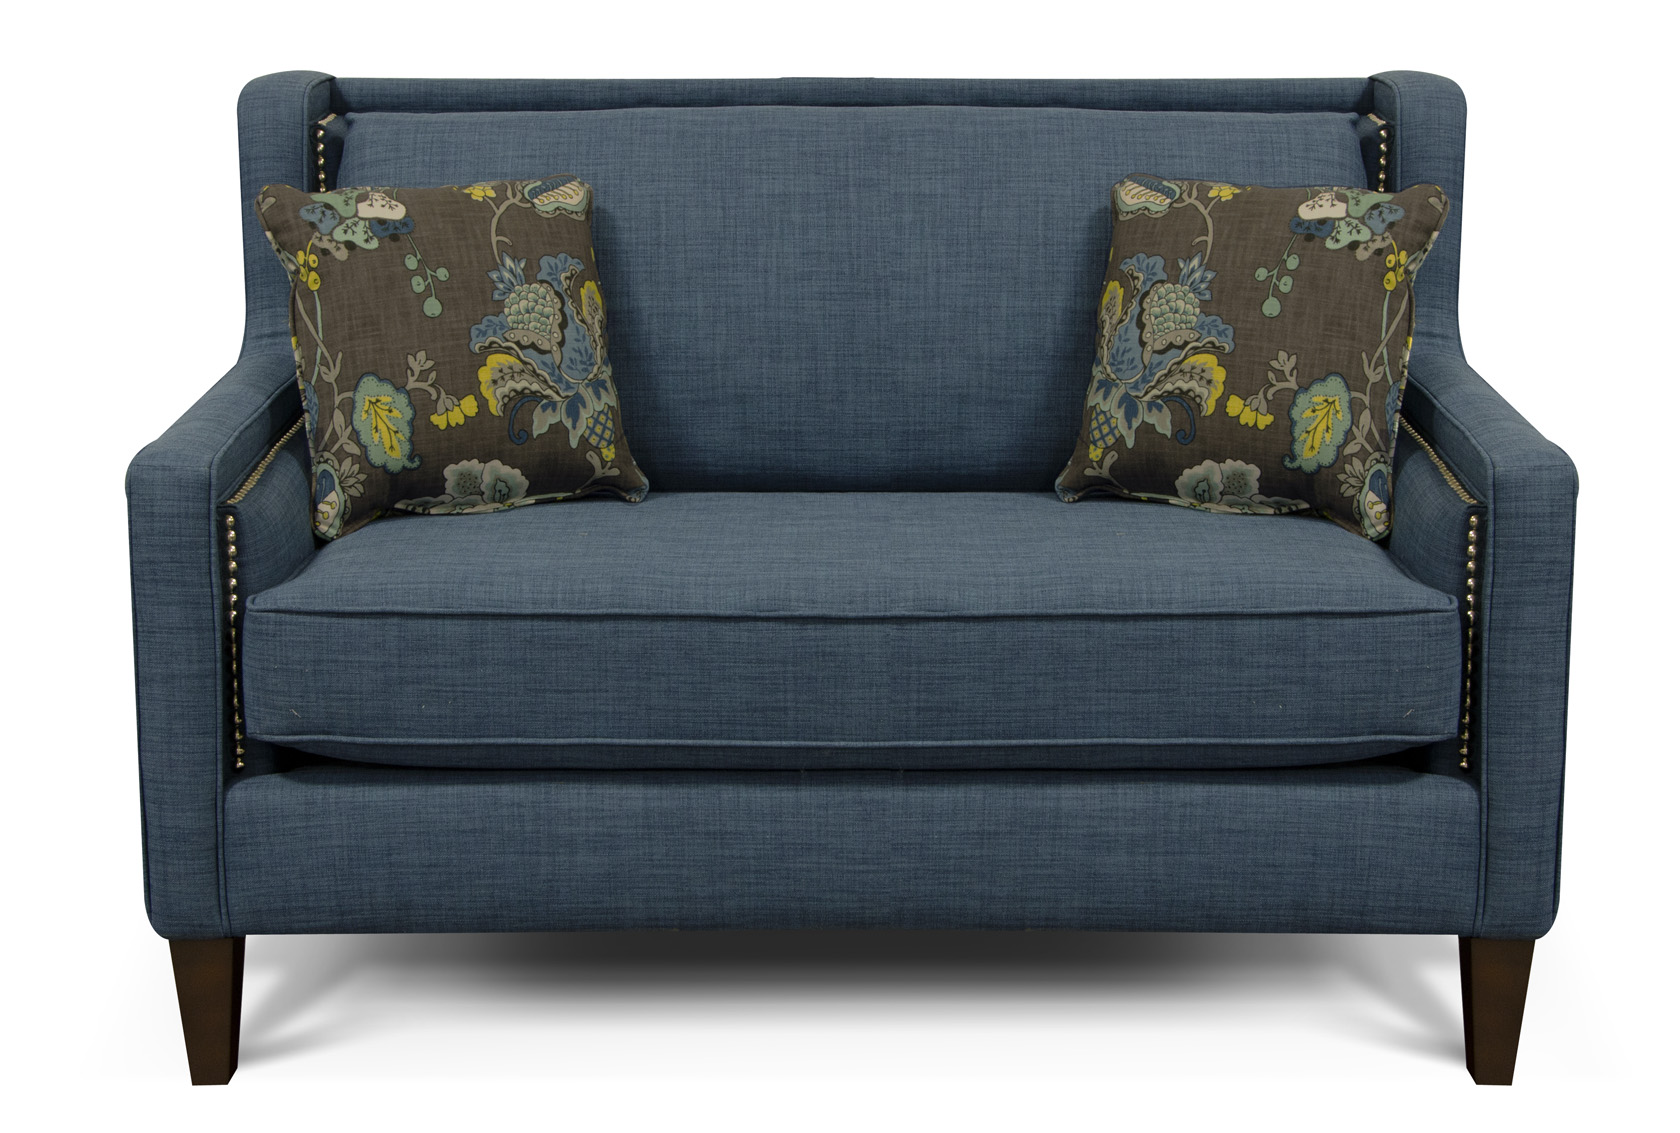 england sofas reviews sofa mid century style sleeper furniture new